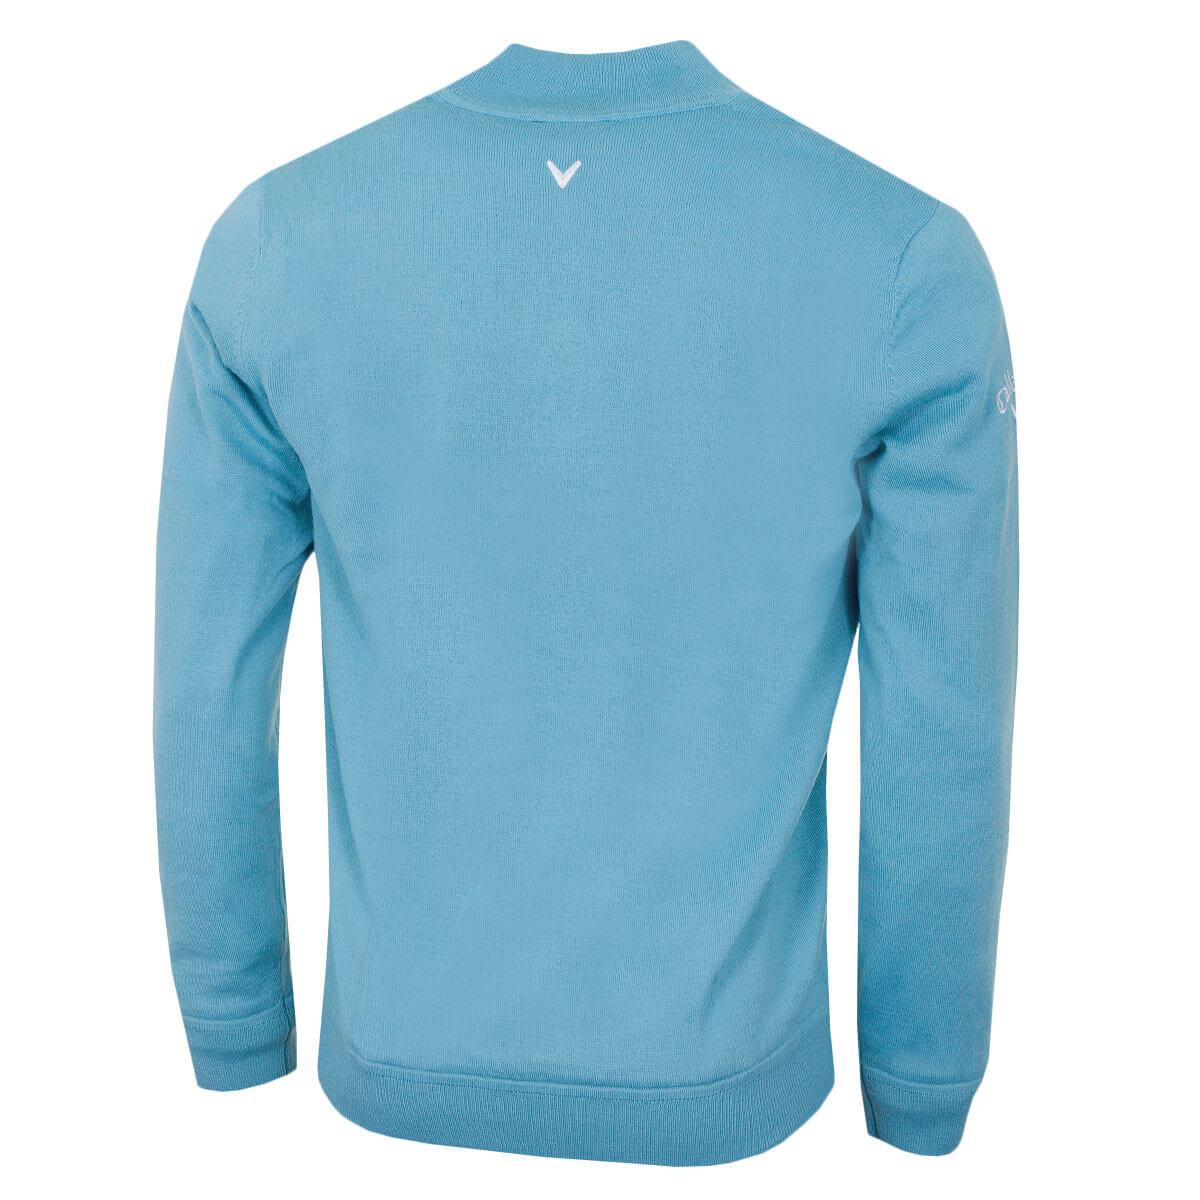 Callaway-Golf-Mens-1-4-Zip-Mock-Merino-Windproof-Sweater-Pullover-49-OFF-RRP thumbnail 6